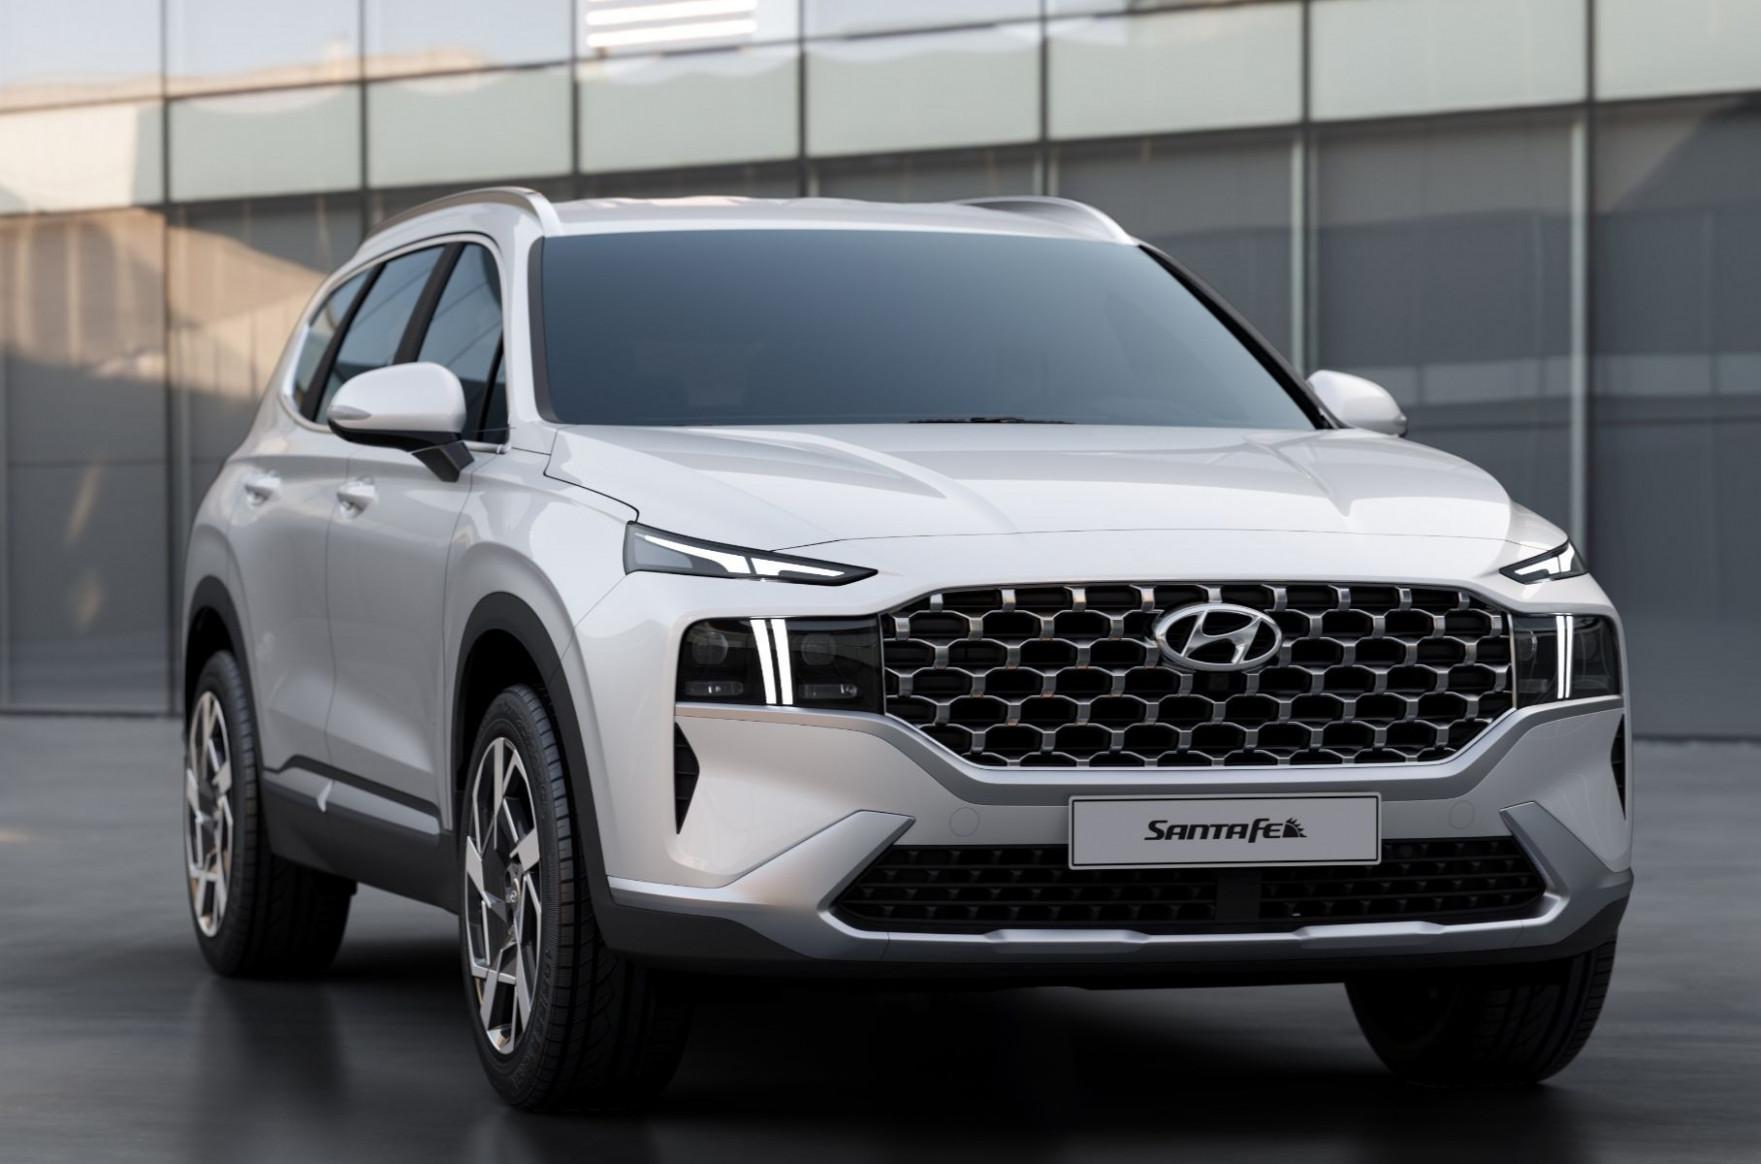 Release 2022 Hyundai Santa Fe